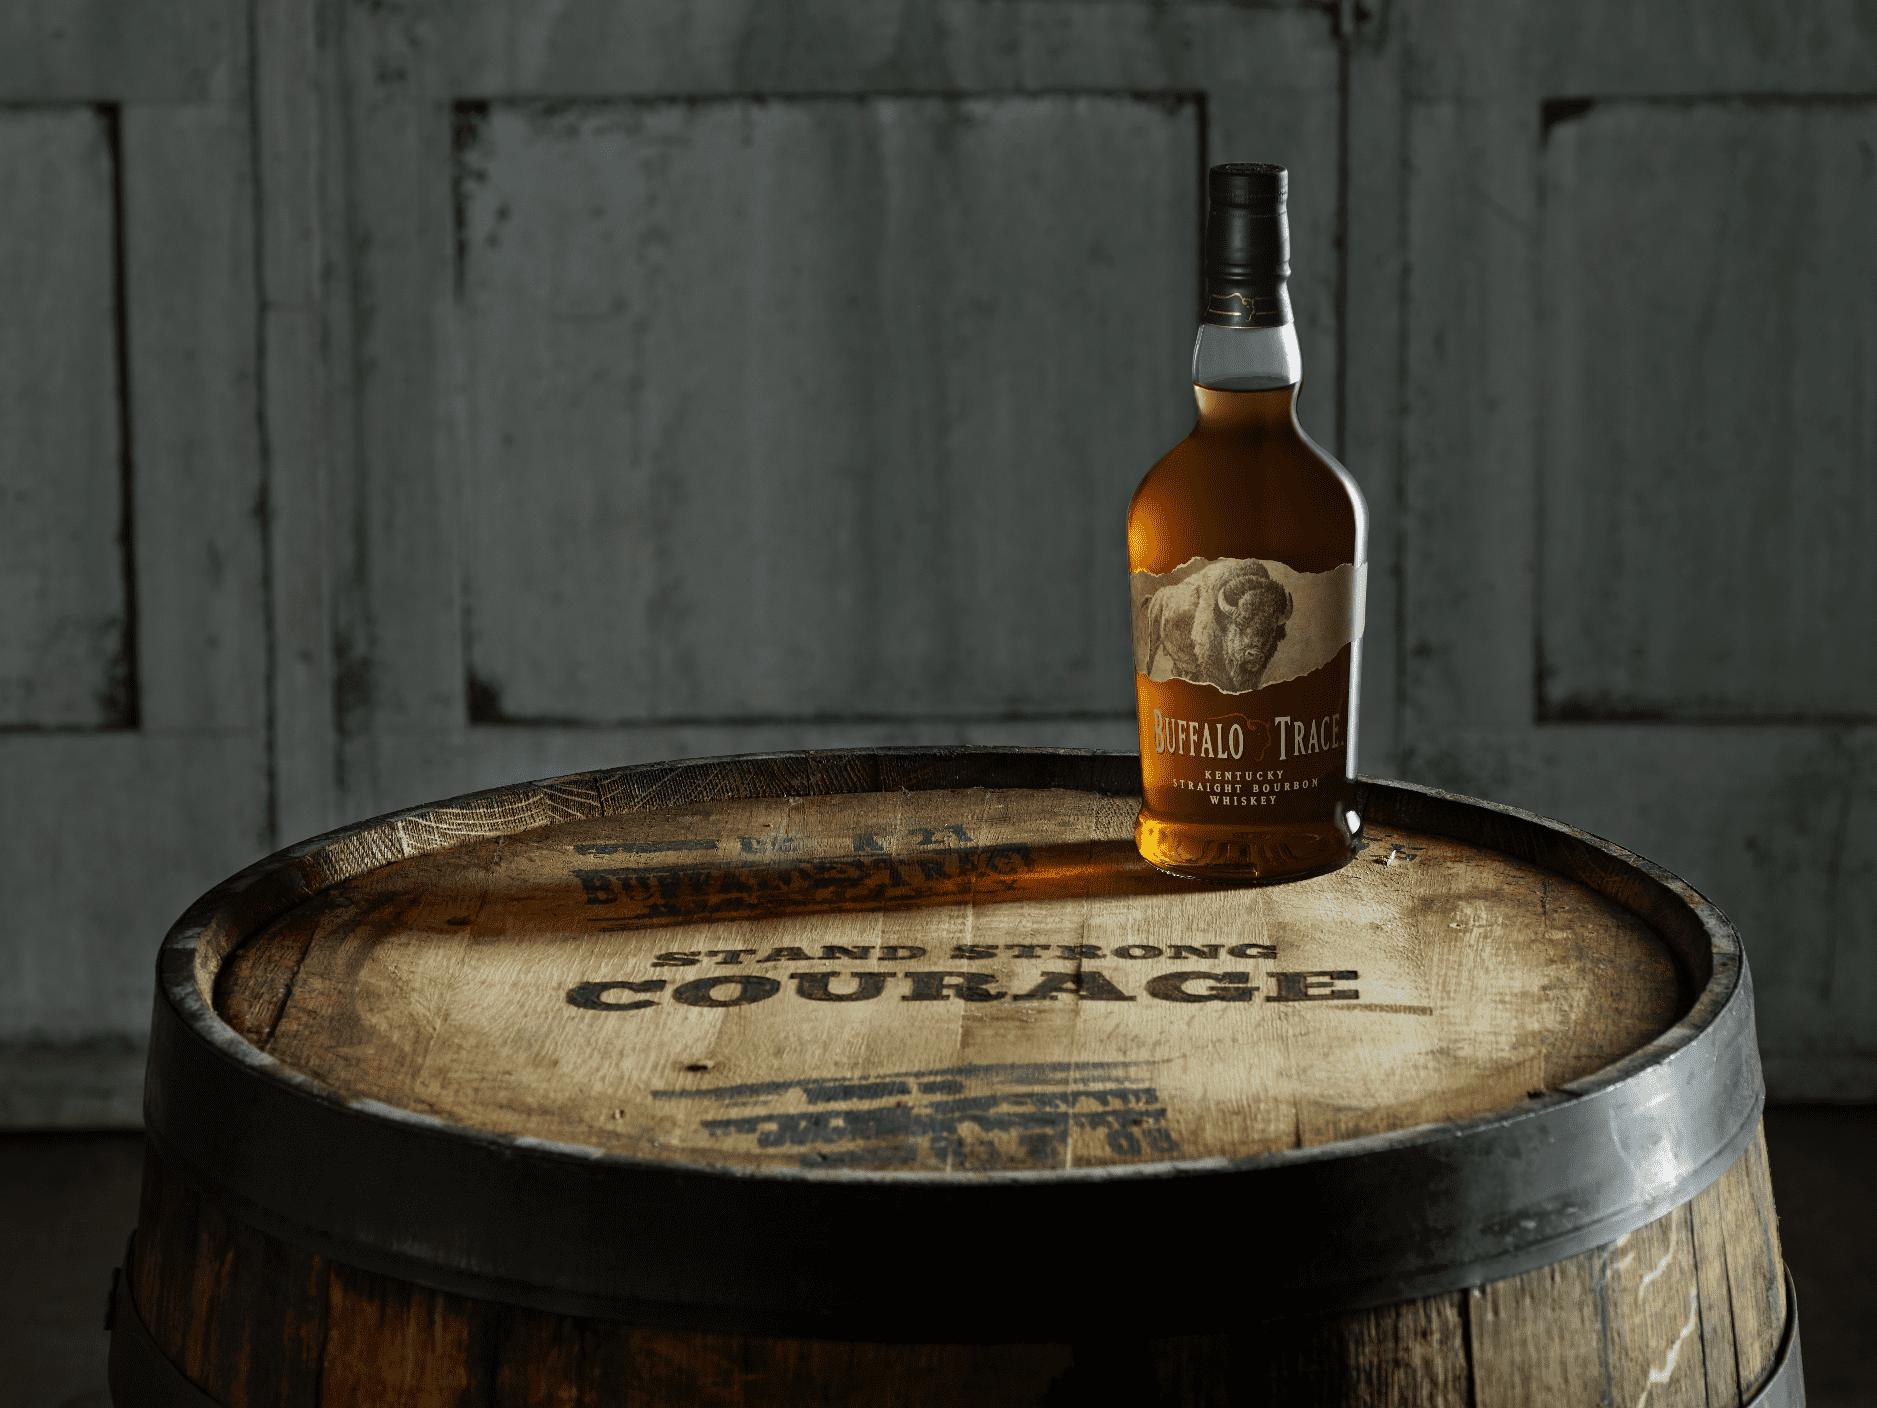 Buffalo Trace - barrel and alcohol